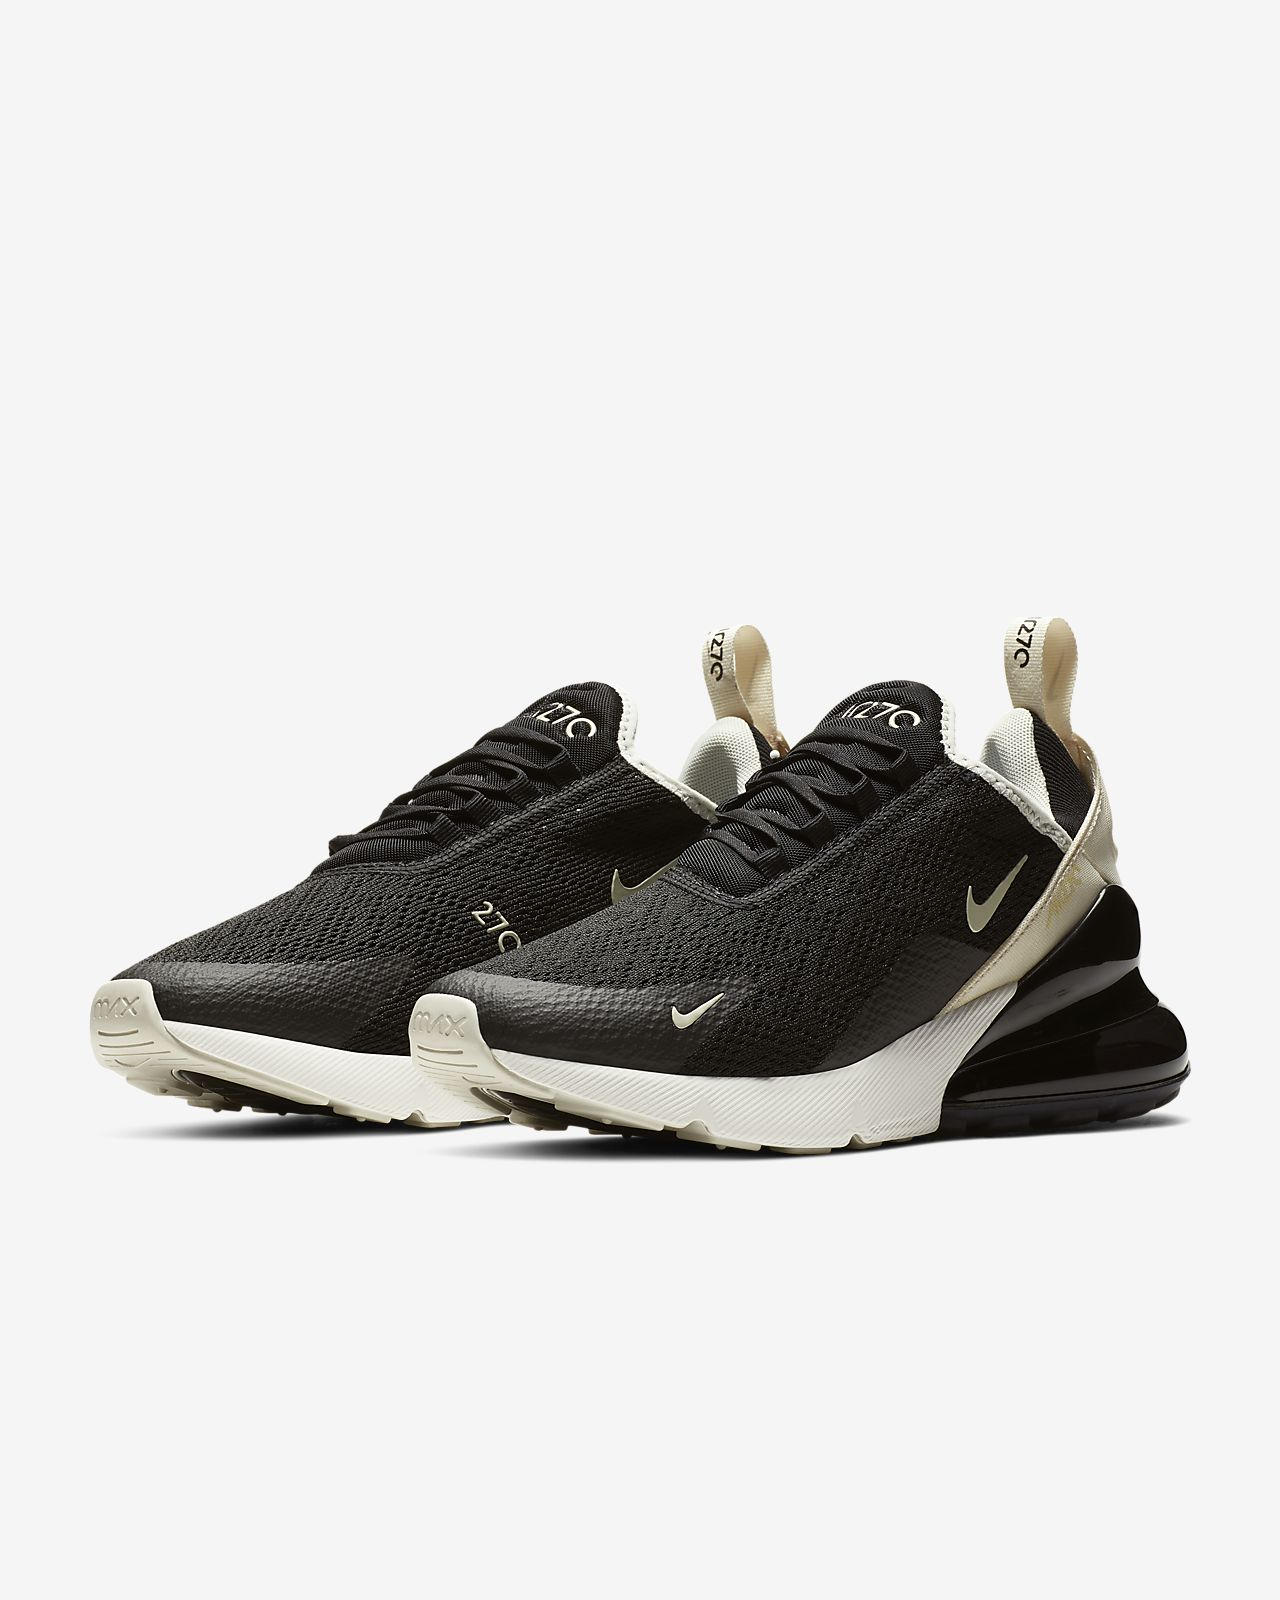 61089db46 Calzado para mujer Nike Air Max 270. Nike.com MX